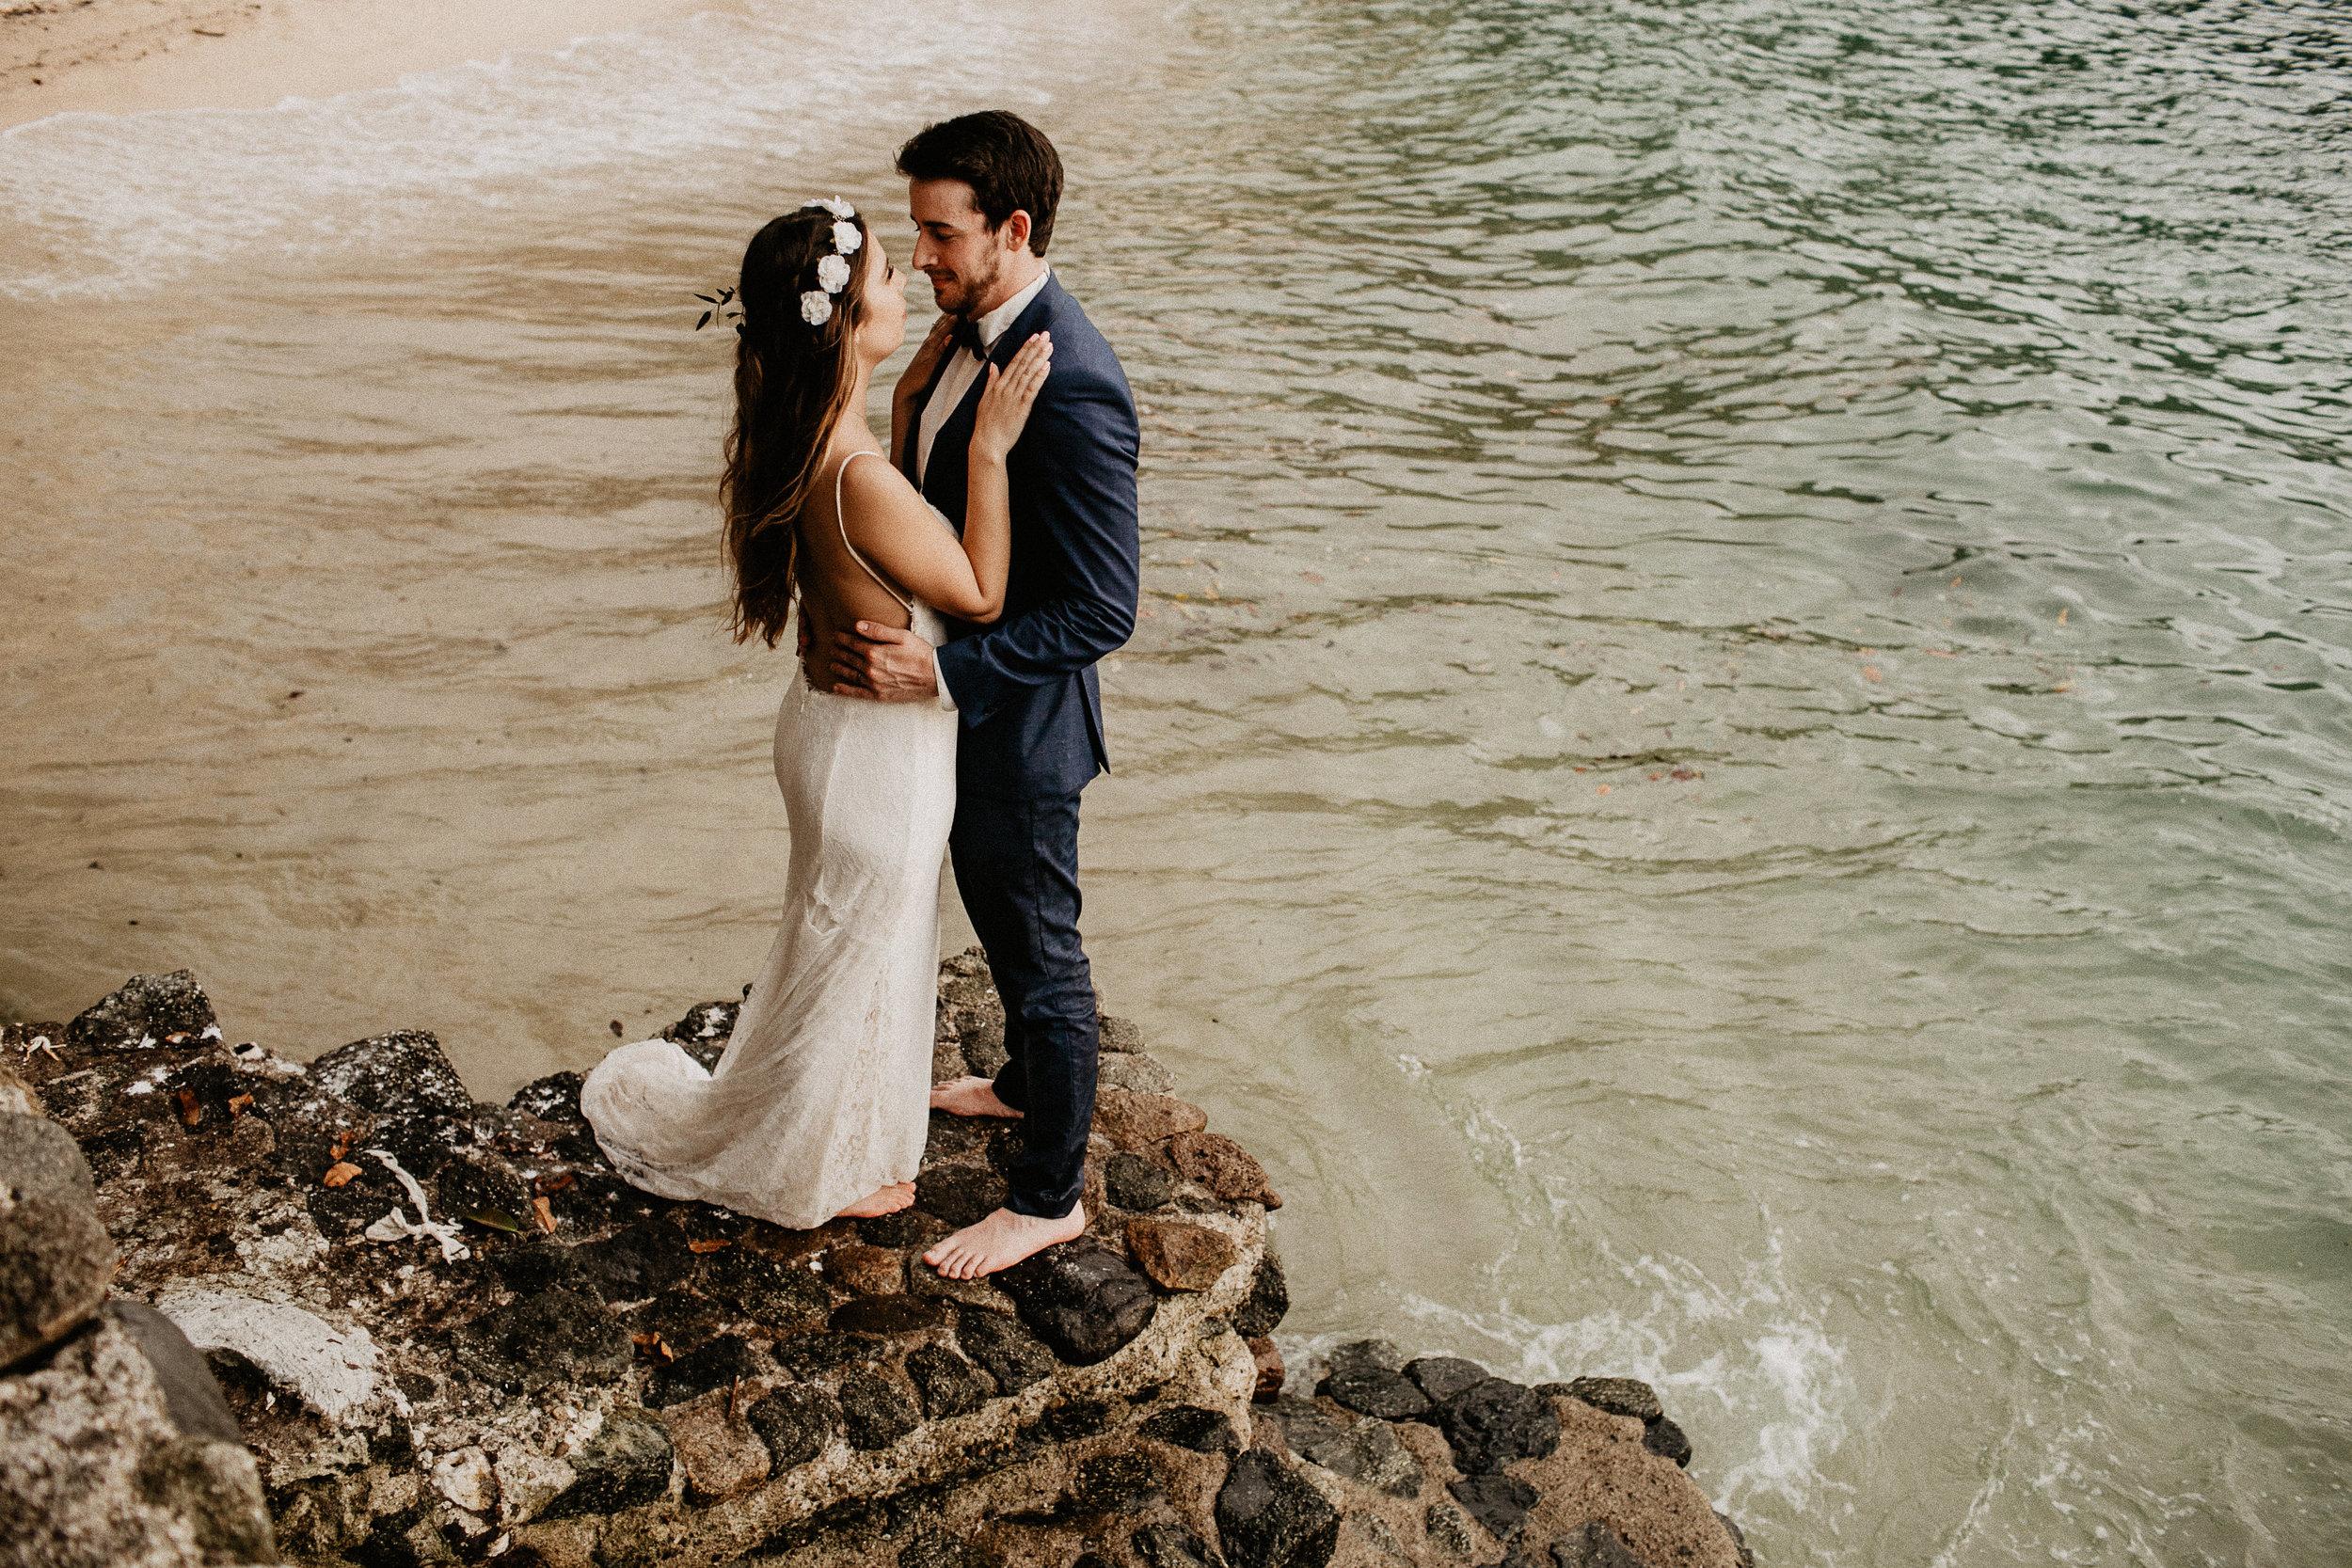 alfonso_flores_destination_wedding_photography_puerto_vallarta_hotel_barcelo_vallarta_cuttler_amela-737.JPG